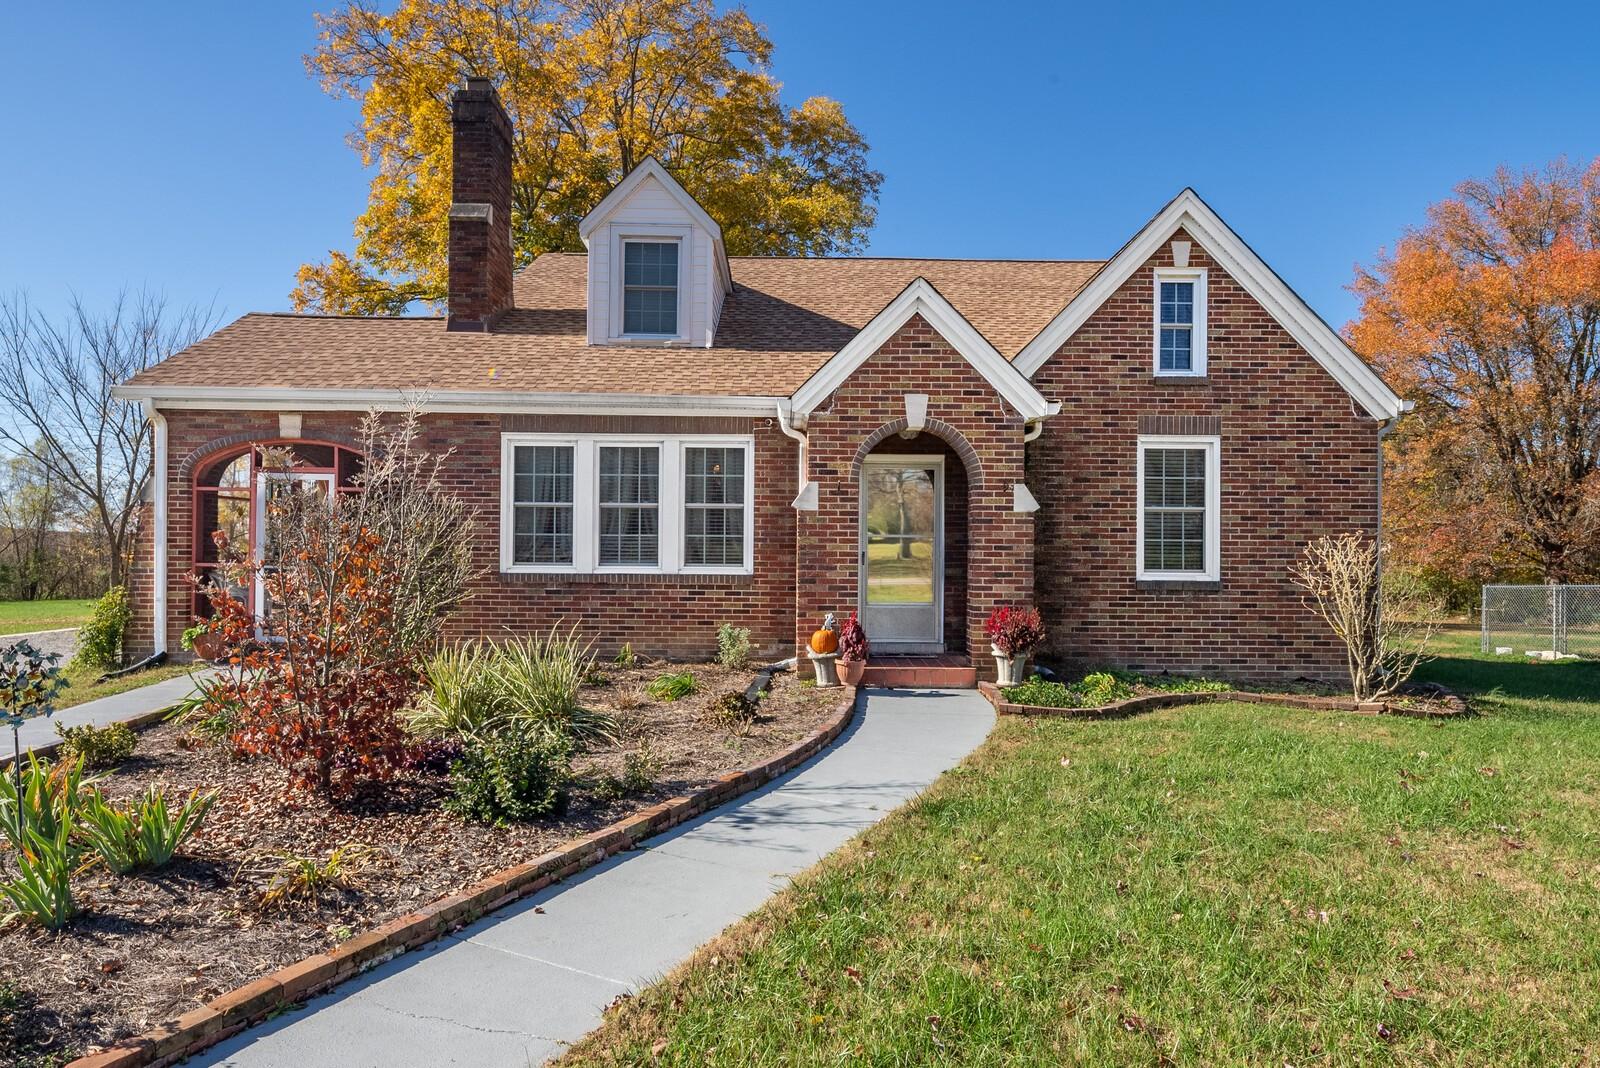 2113 S Main St Property Photo